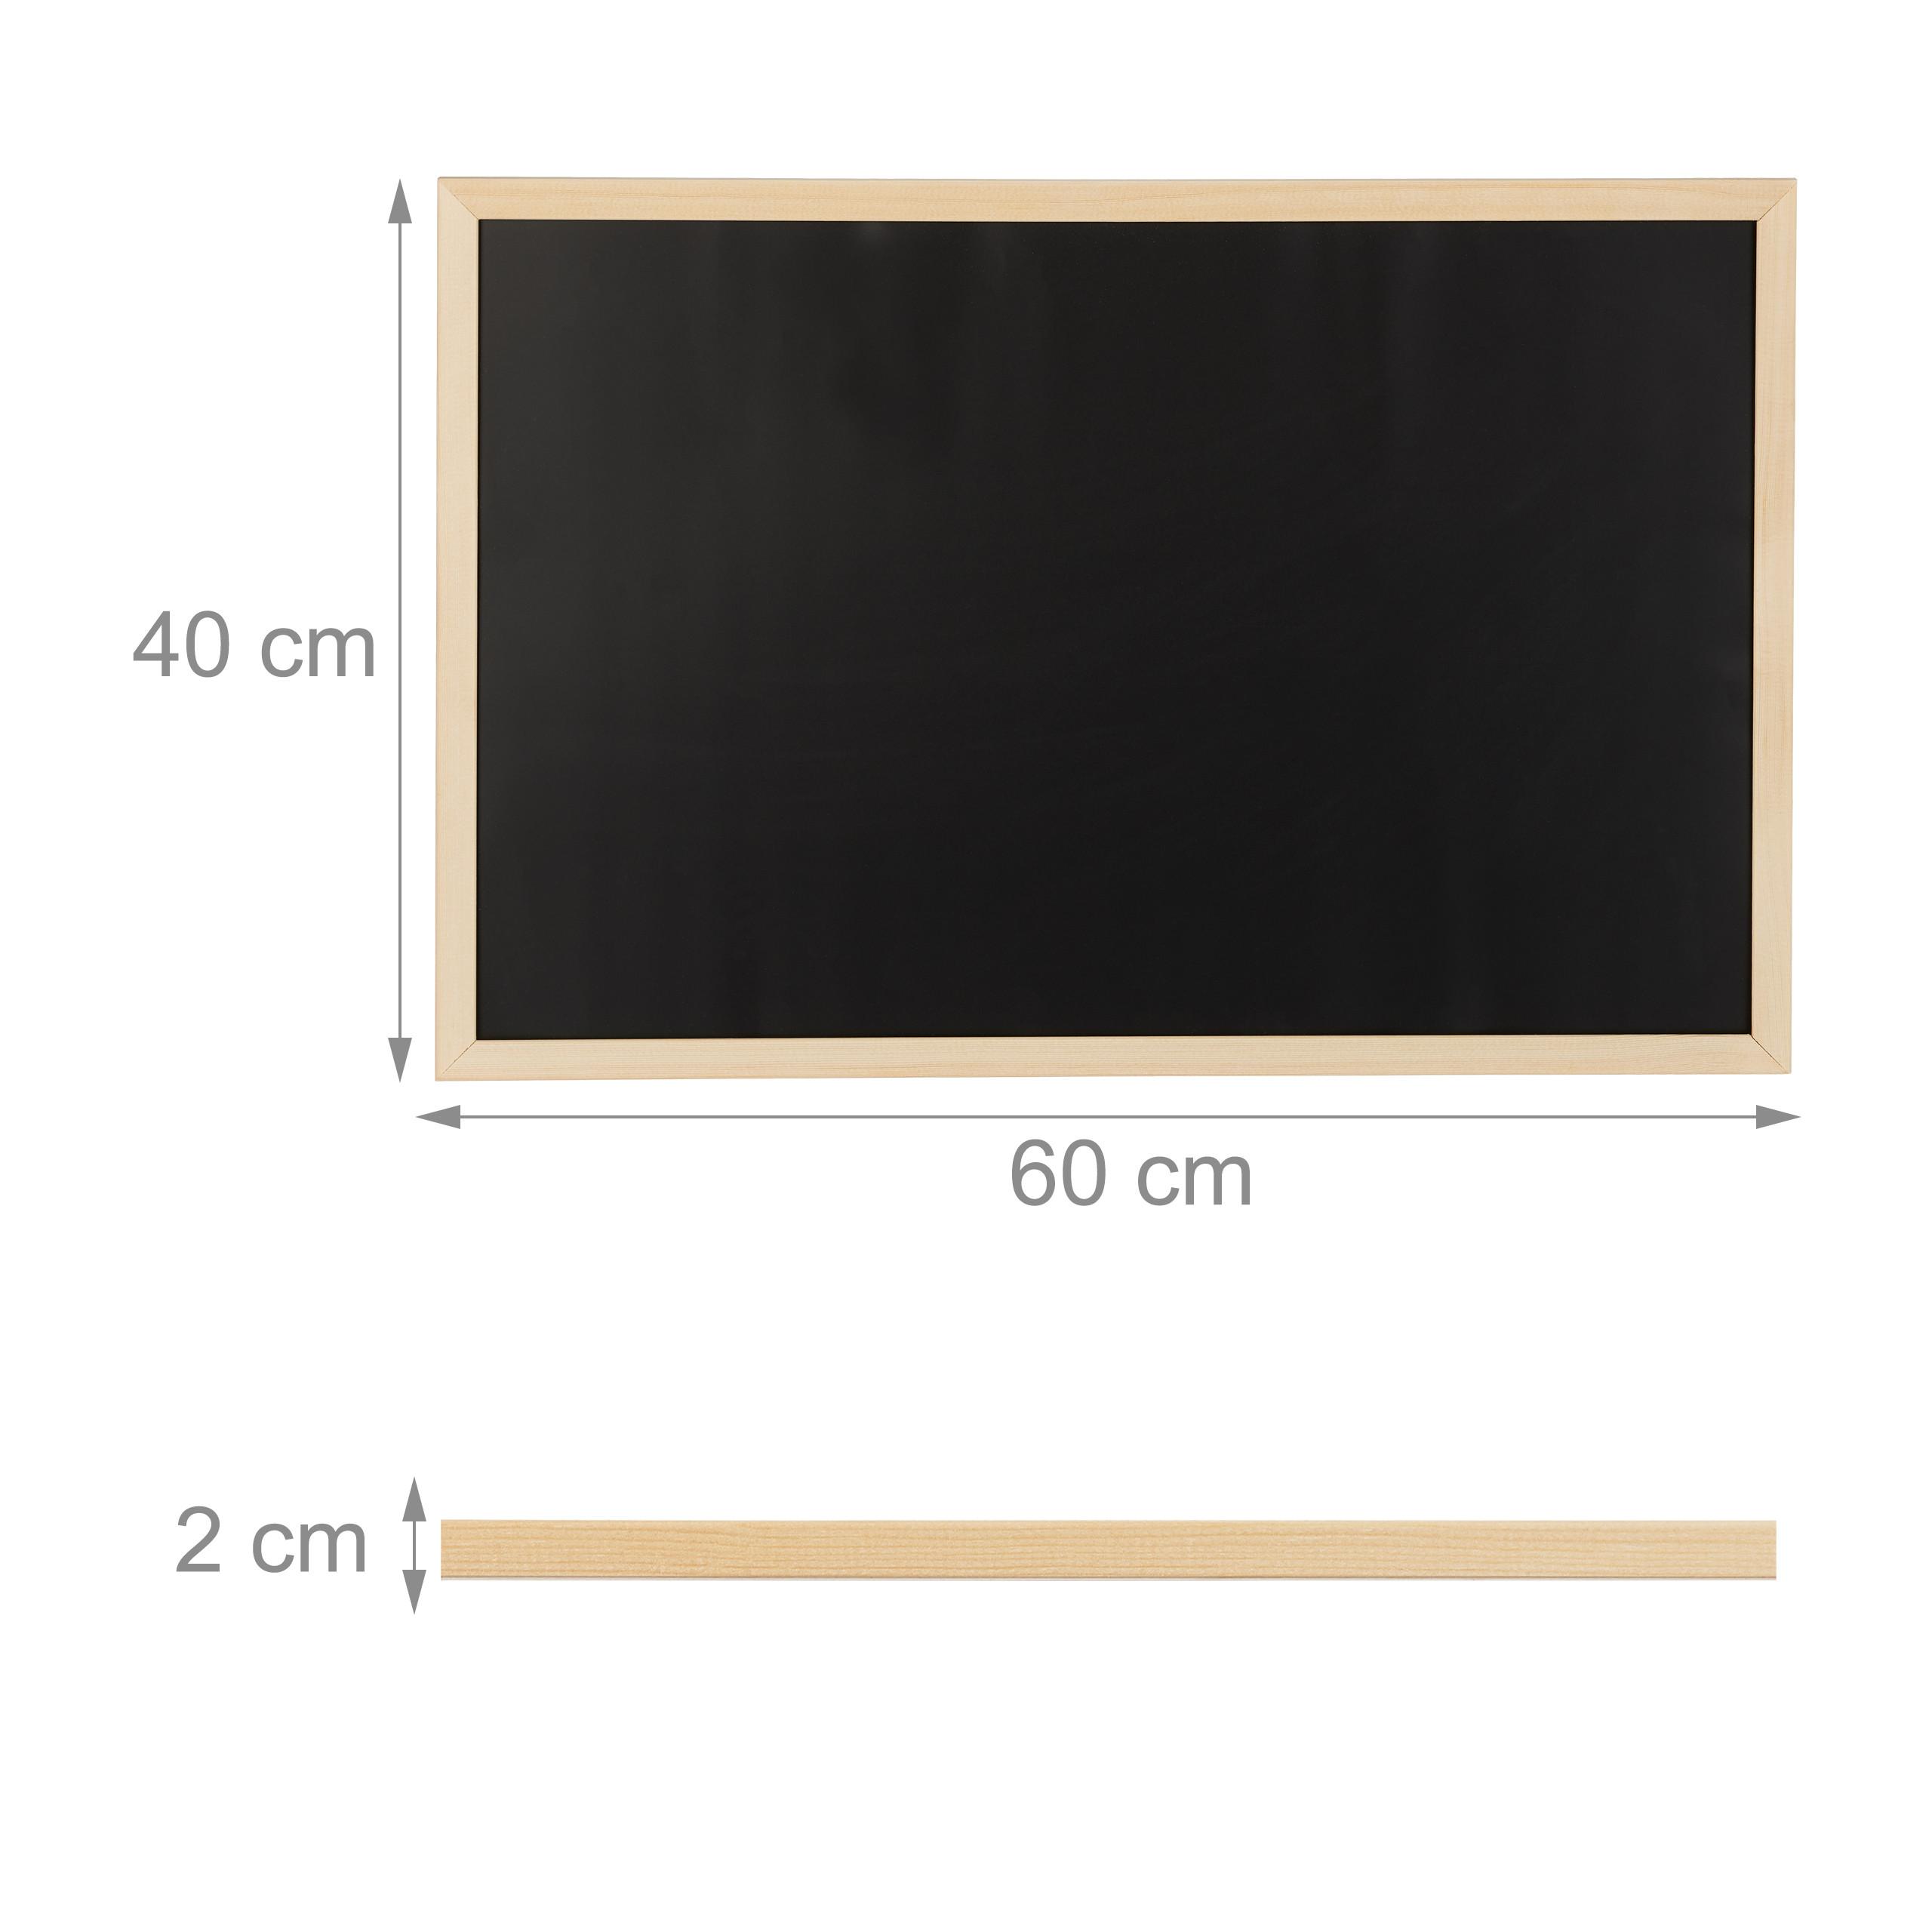 Kreidetafel mit Holzrahmen Tafel Blackboard Office Büro Organizer Notiztafel